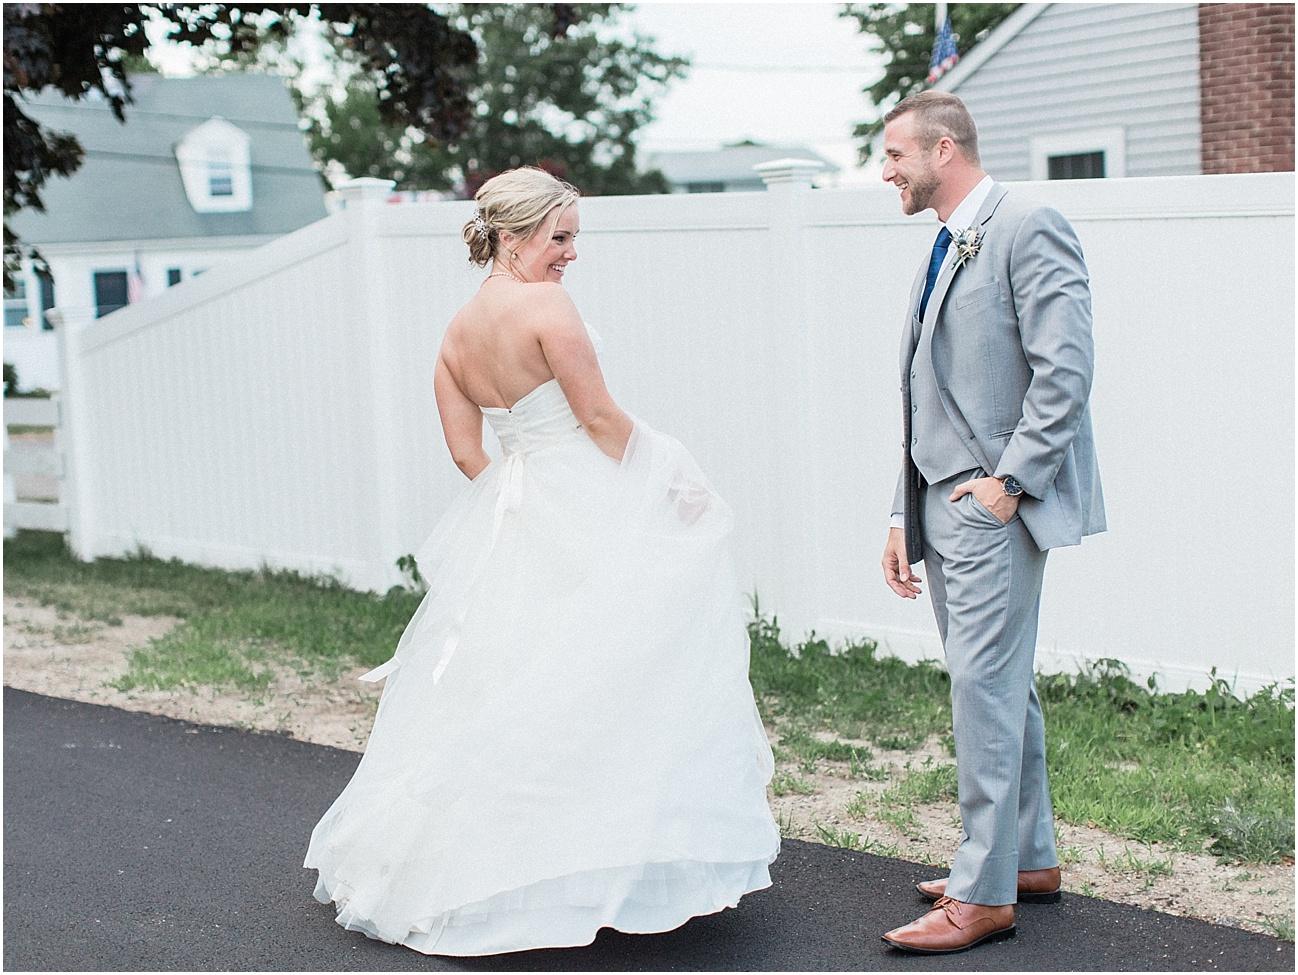 samantha_anthony_sam_old_scituate_light_barker_tavern_south_shore_cape_cod_boston_wedding_photographer_meredith_jane_photography_photo_0304.jpg